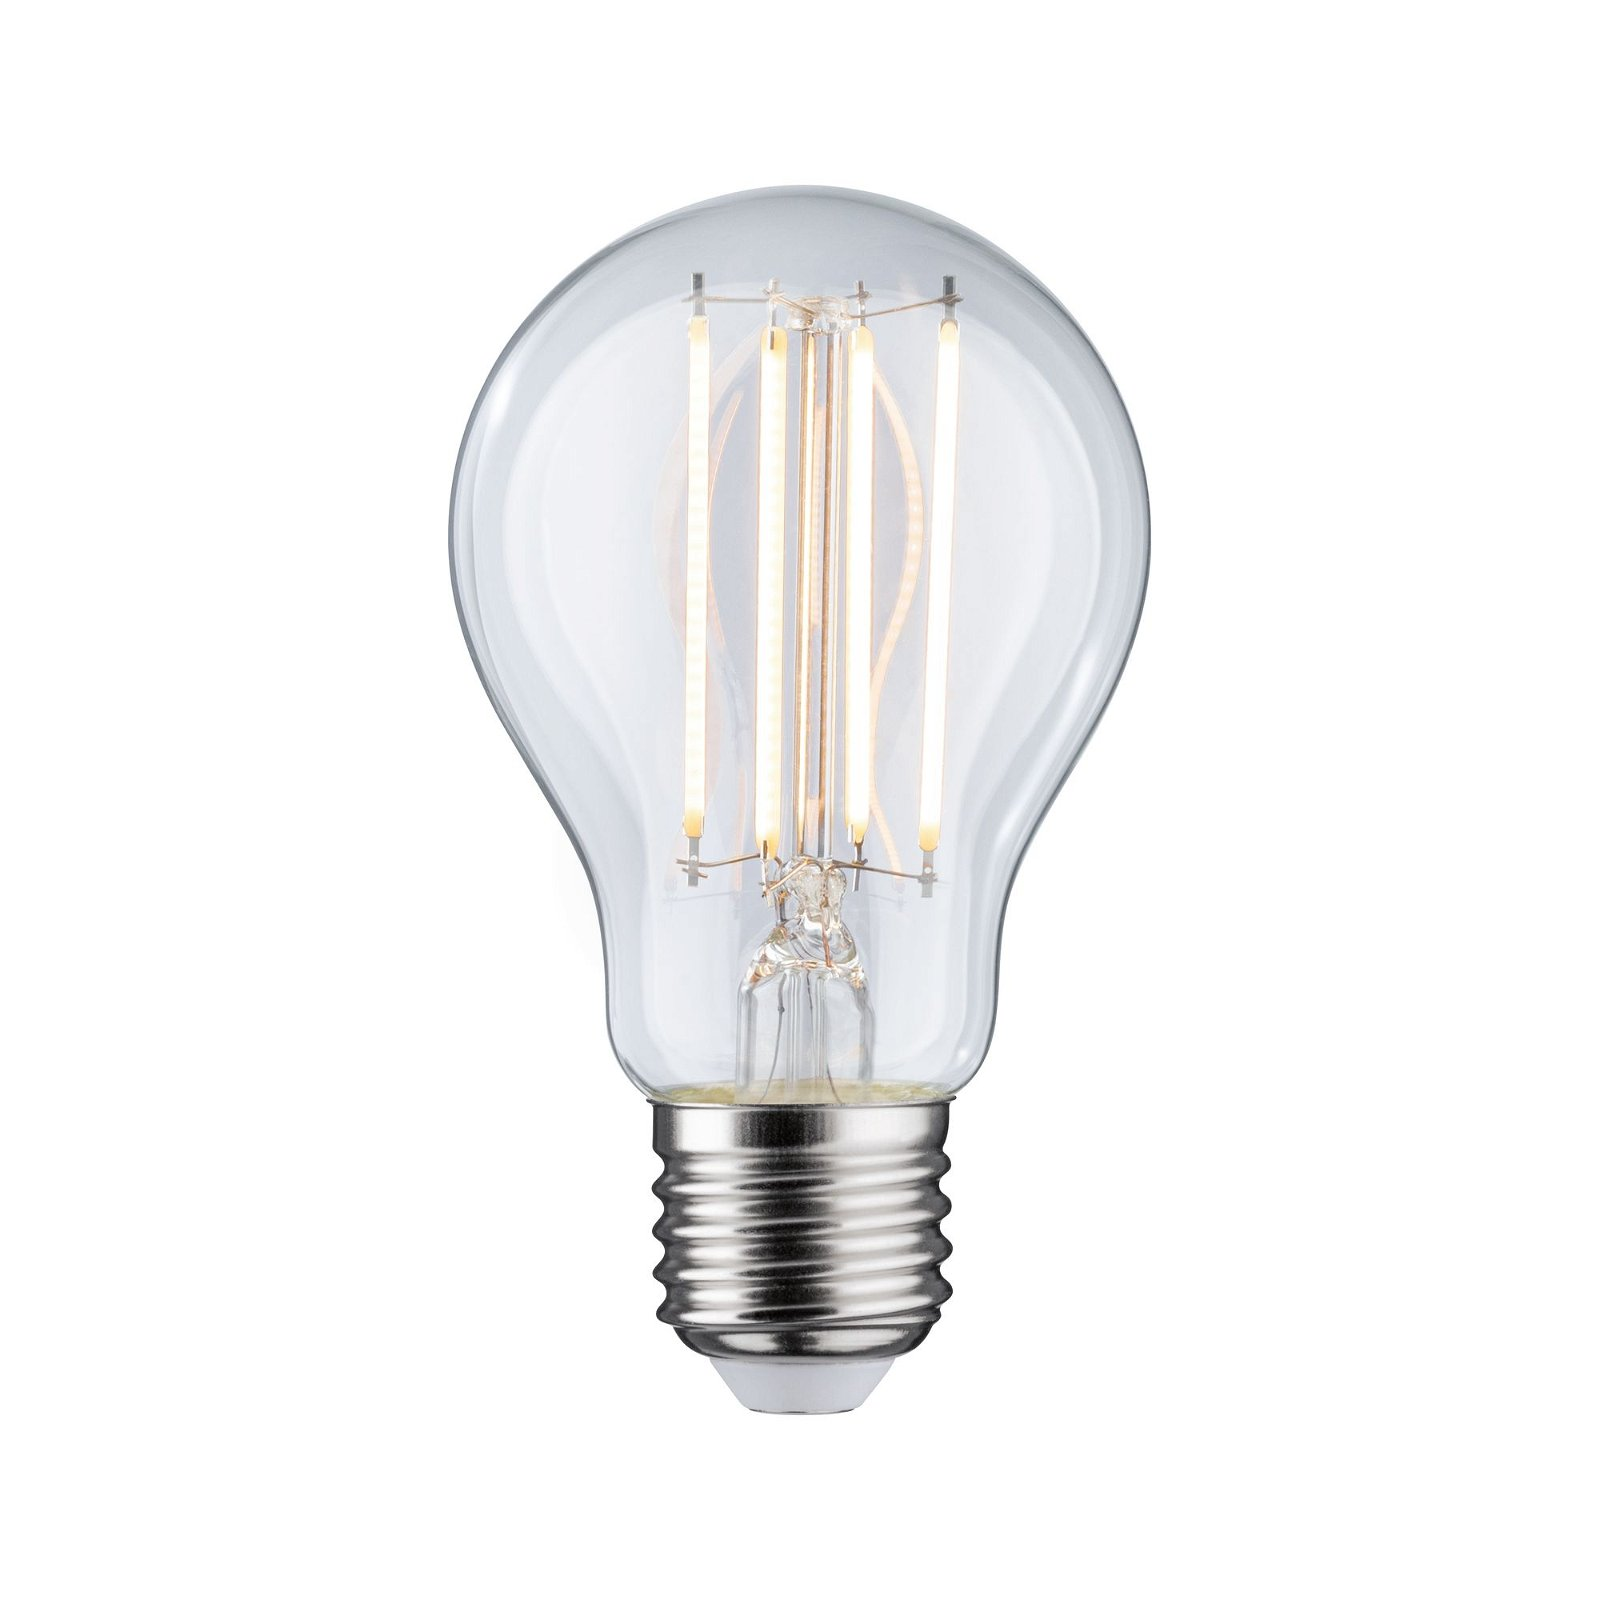 LED Birne Filament E27 230V 1055lm 9W 2700K Klar